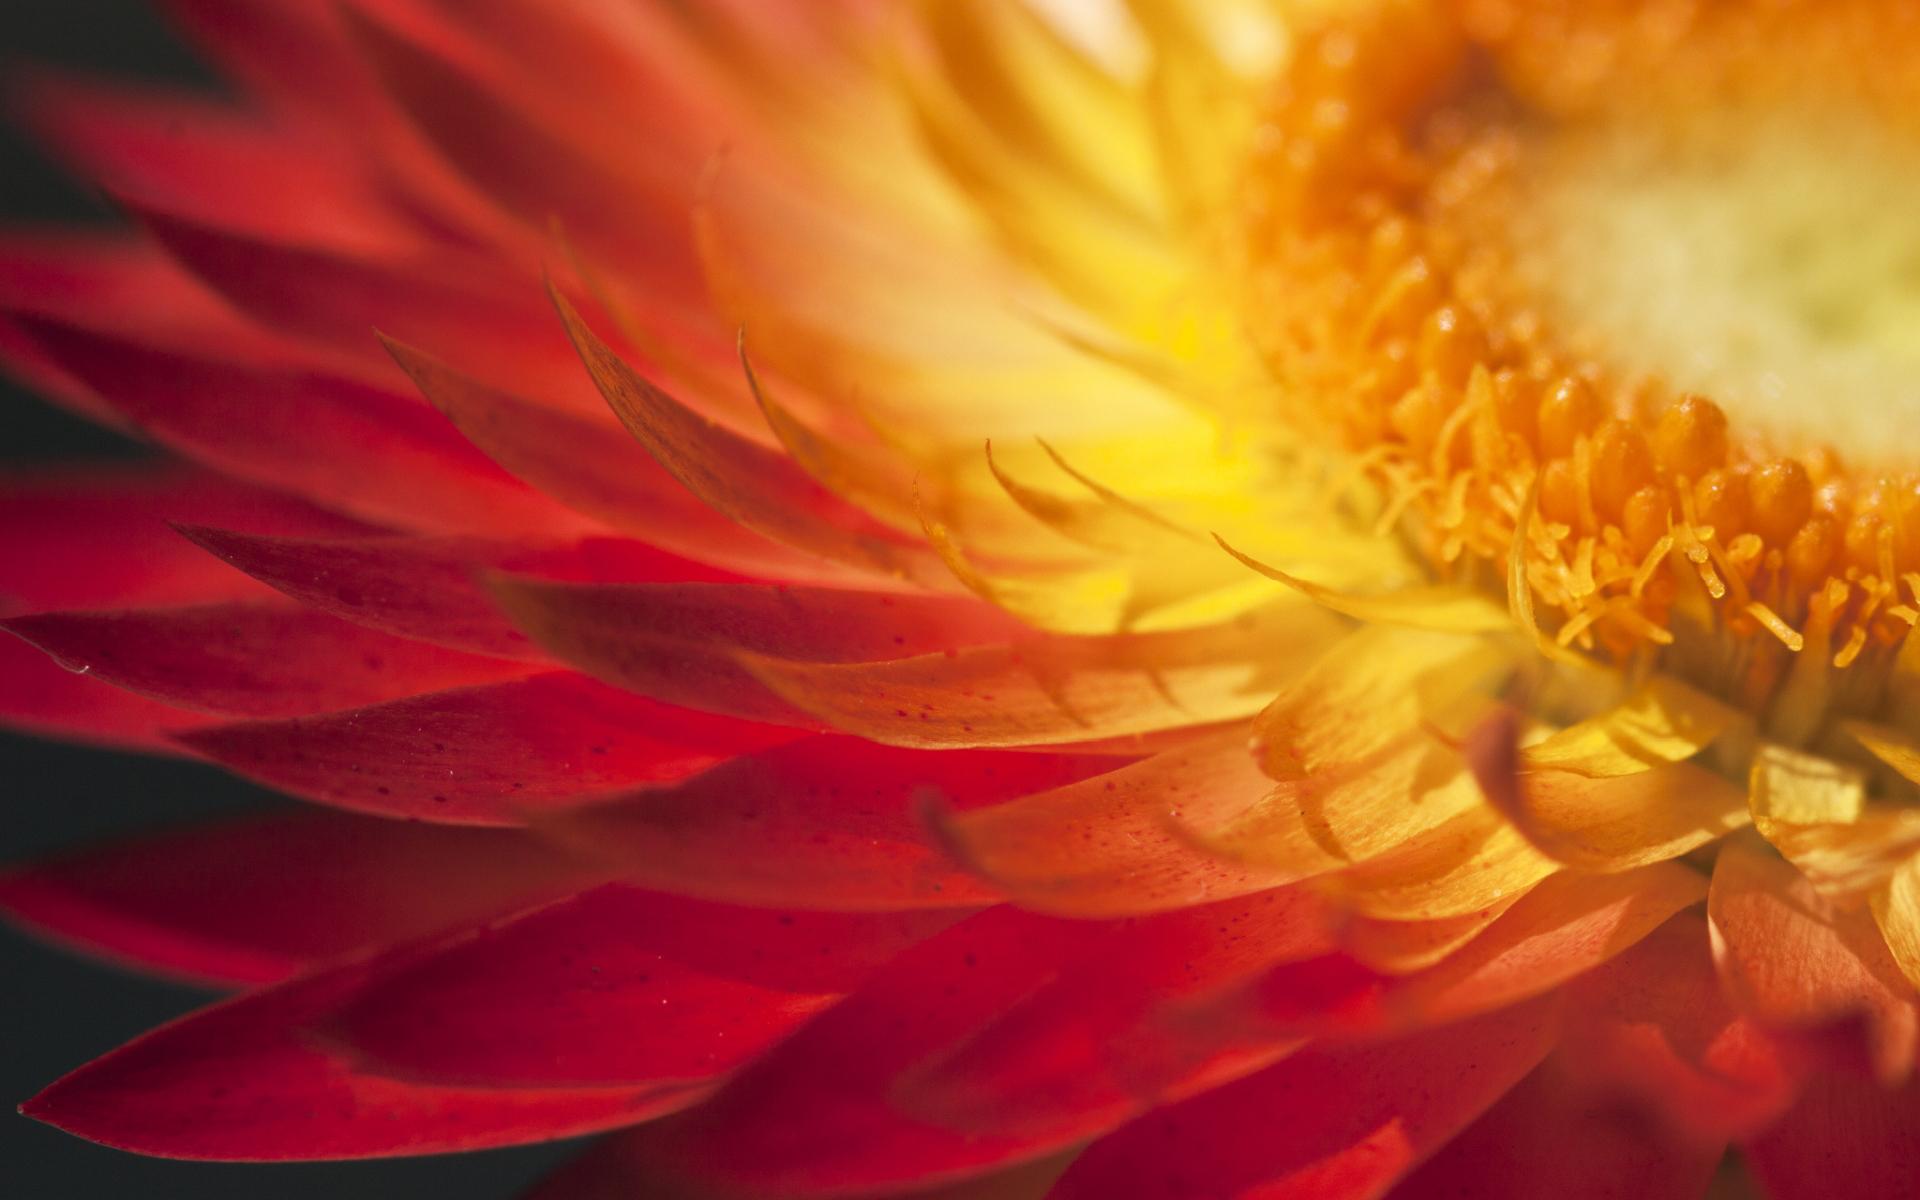 Sunshine Wallpaper Petals - HD Desktop Wallpapers